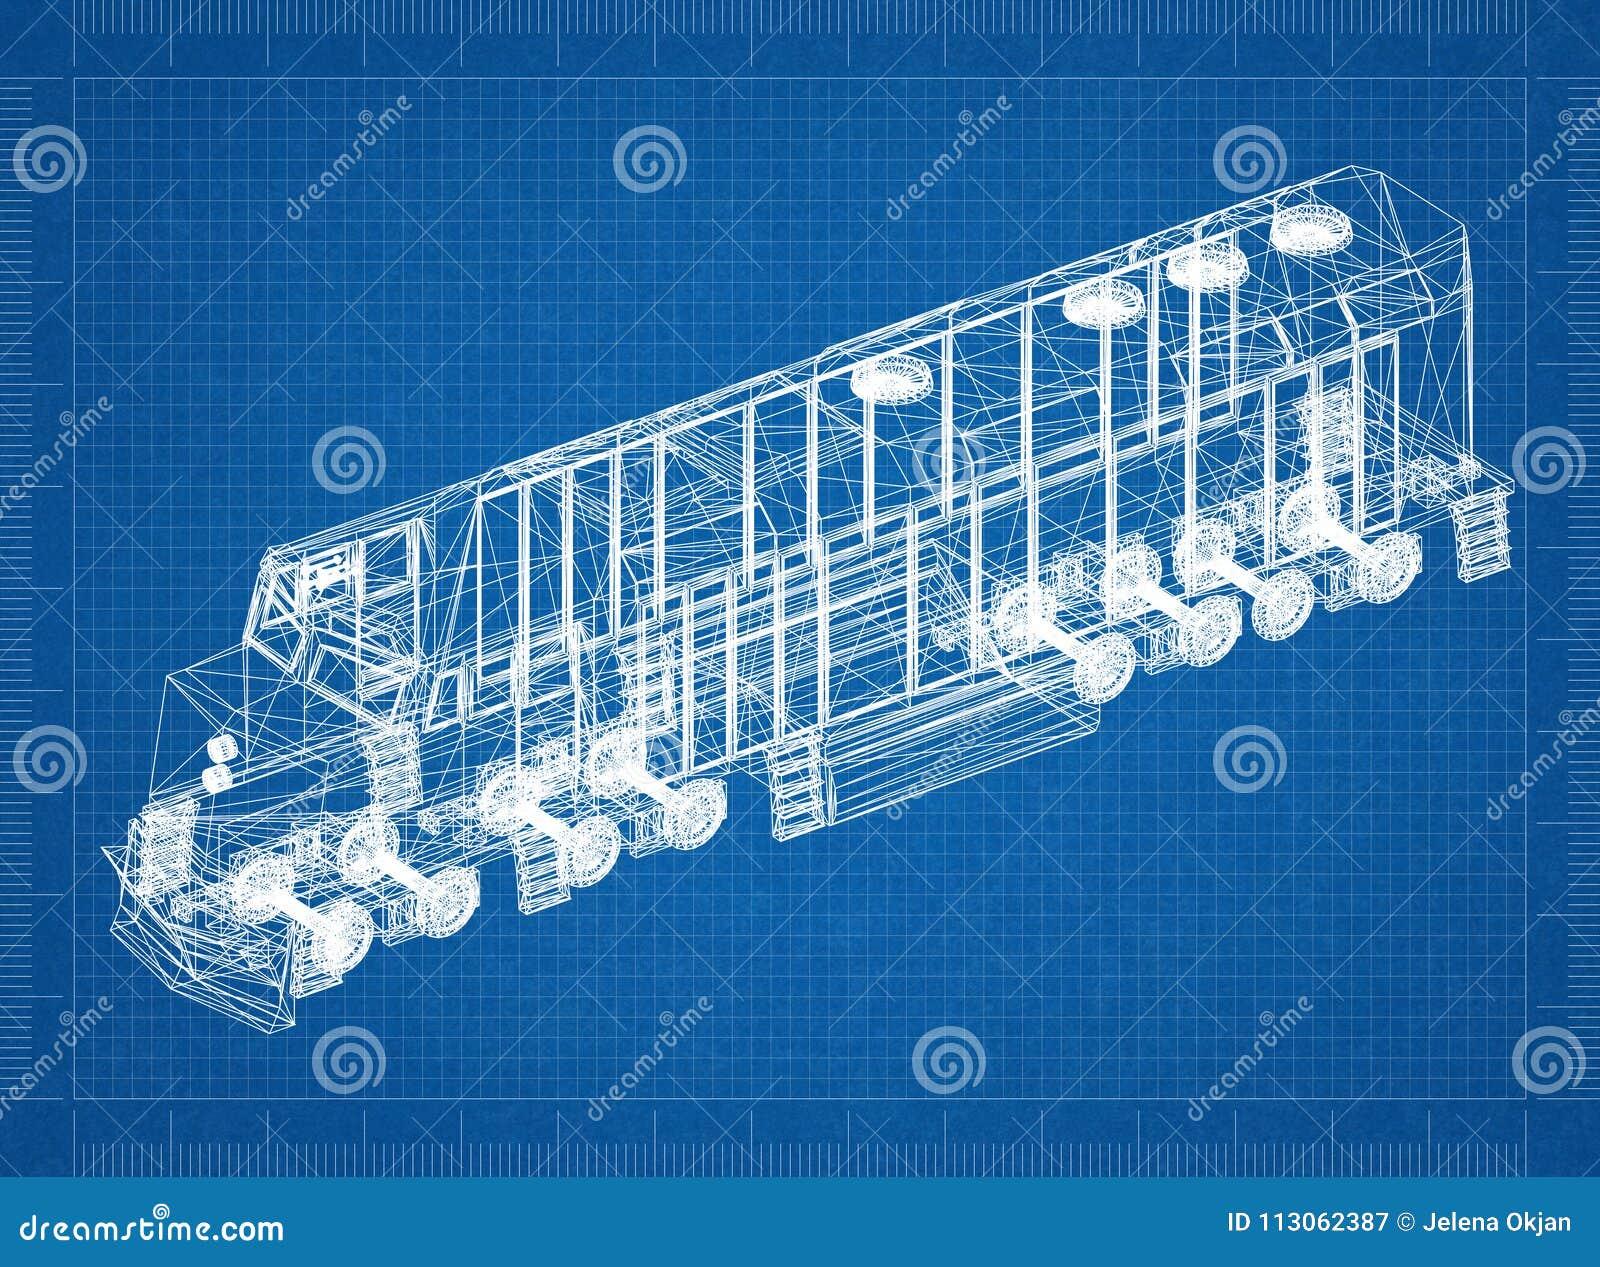 Train locomotive 3D blueprint